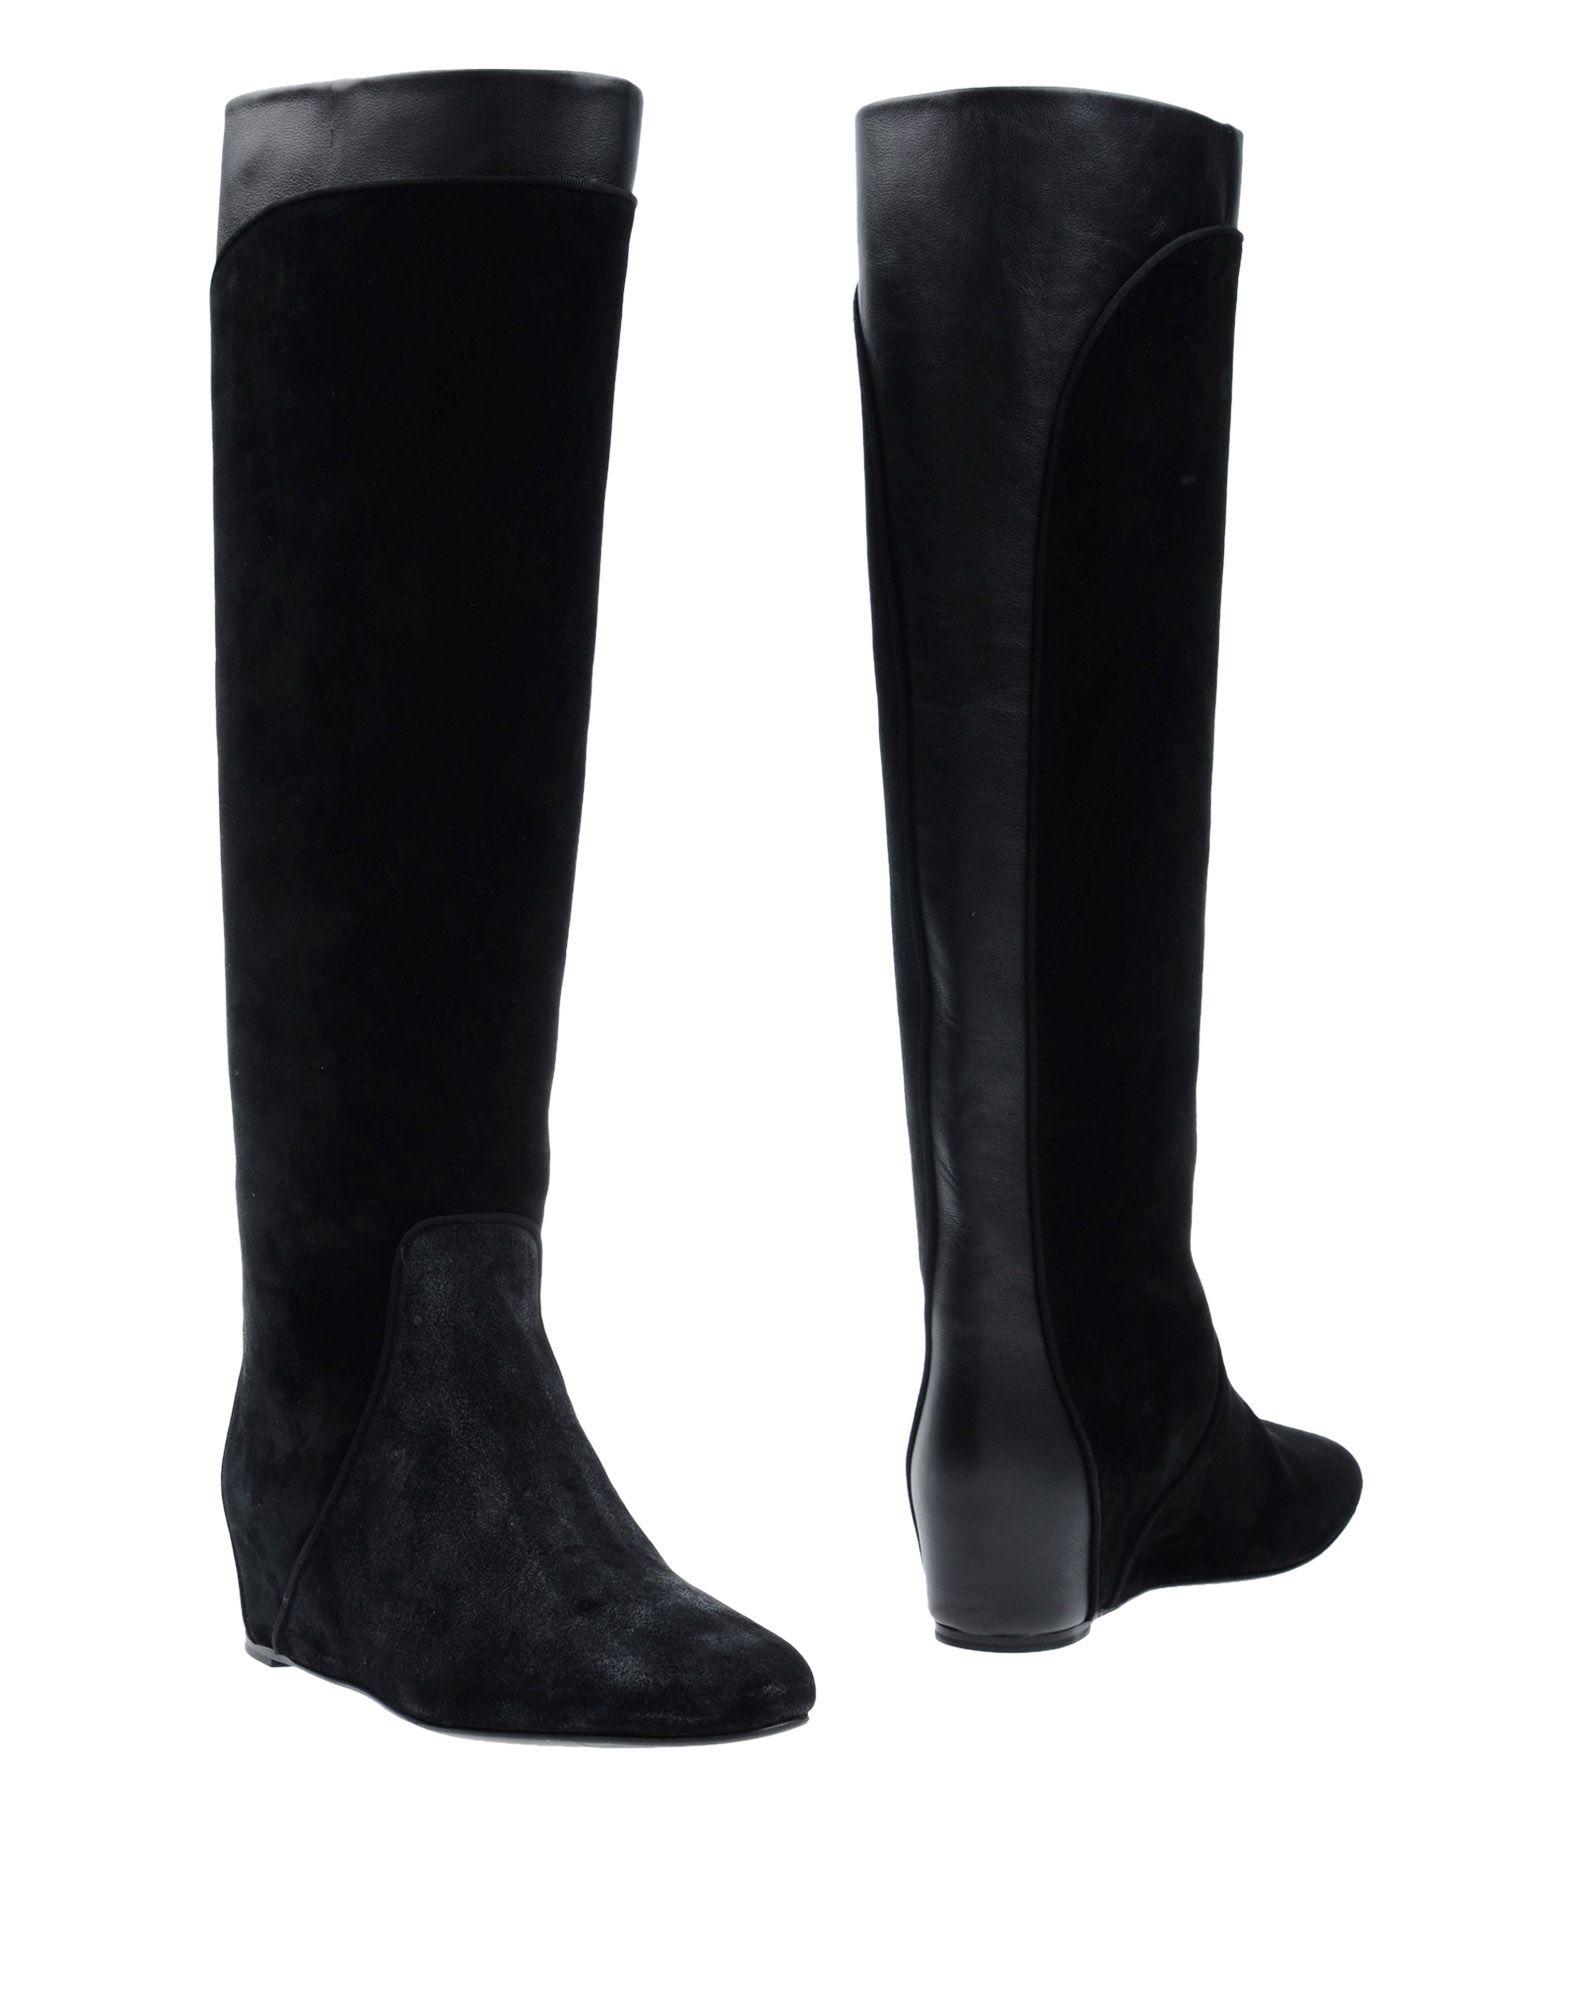 Lanvin Boots - Women Lanvin Boots Kingdom online on  United Kingdom Boots - 11249042AK a10a47